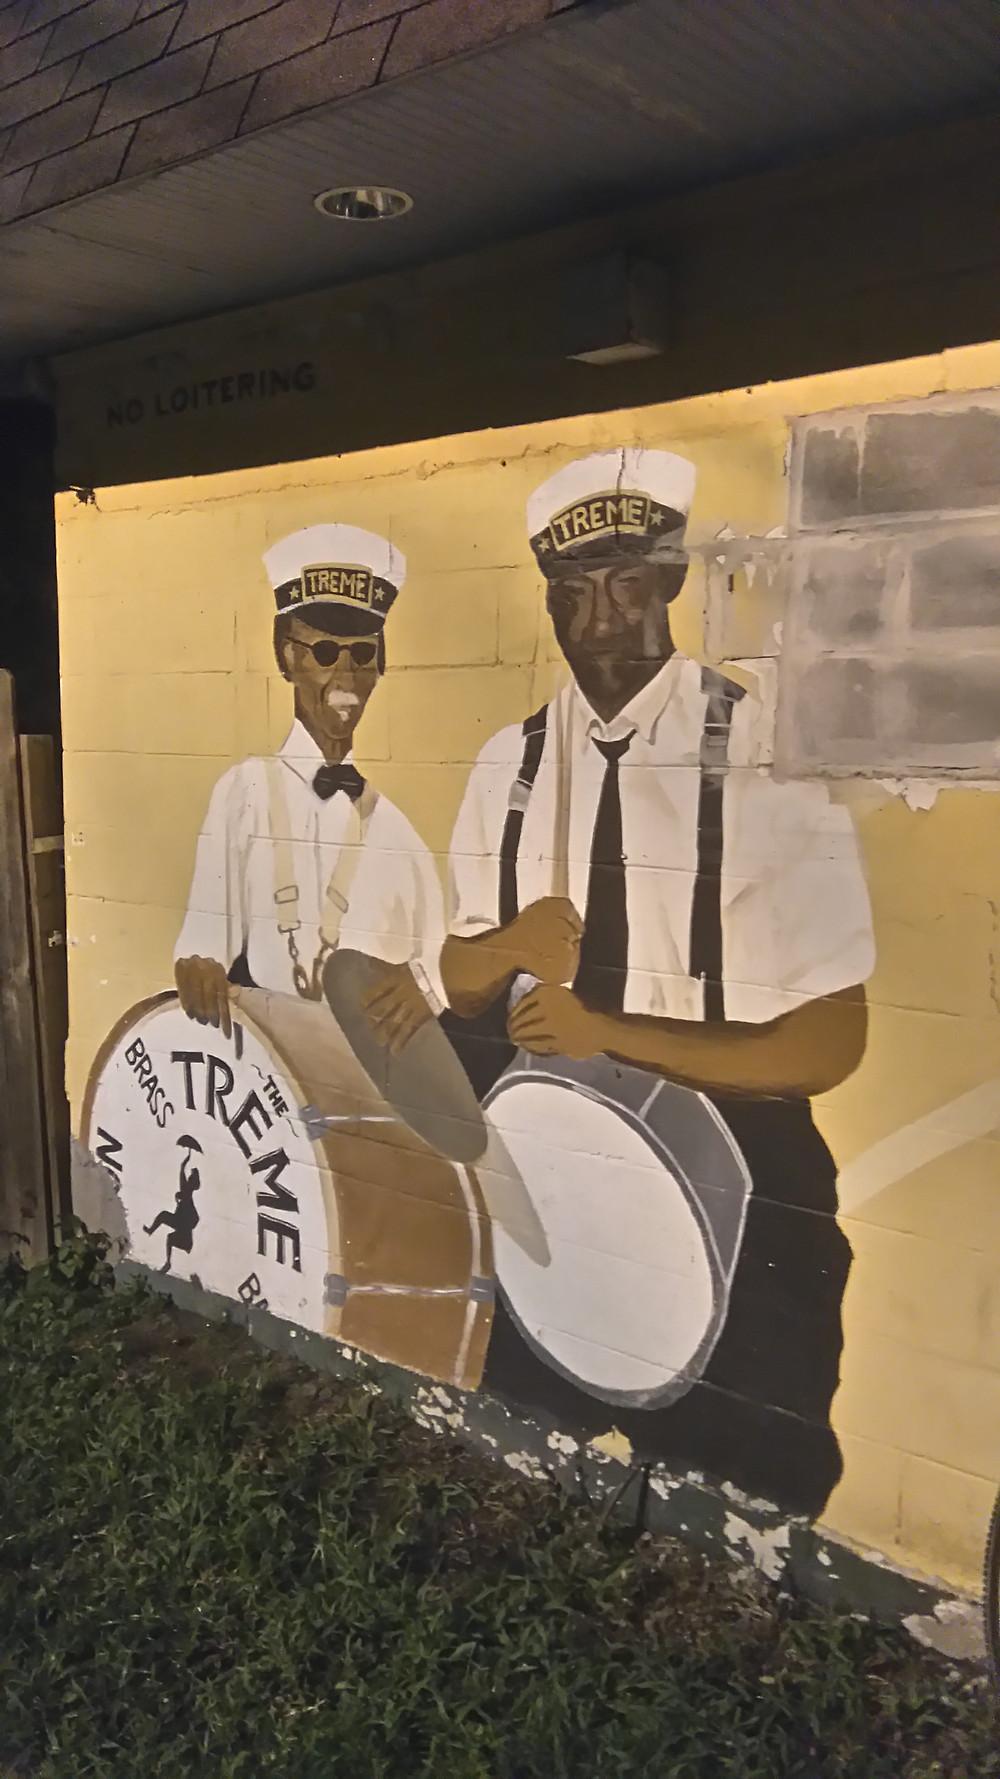 Treme Brass Band mural